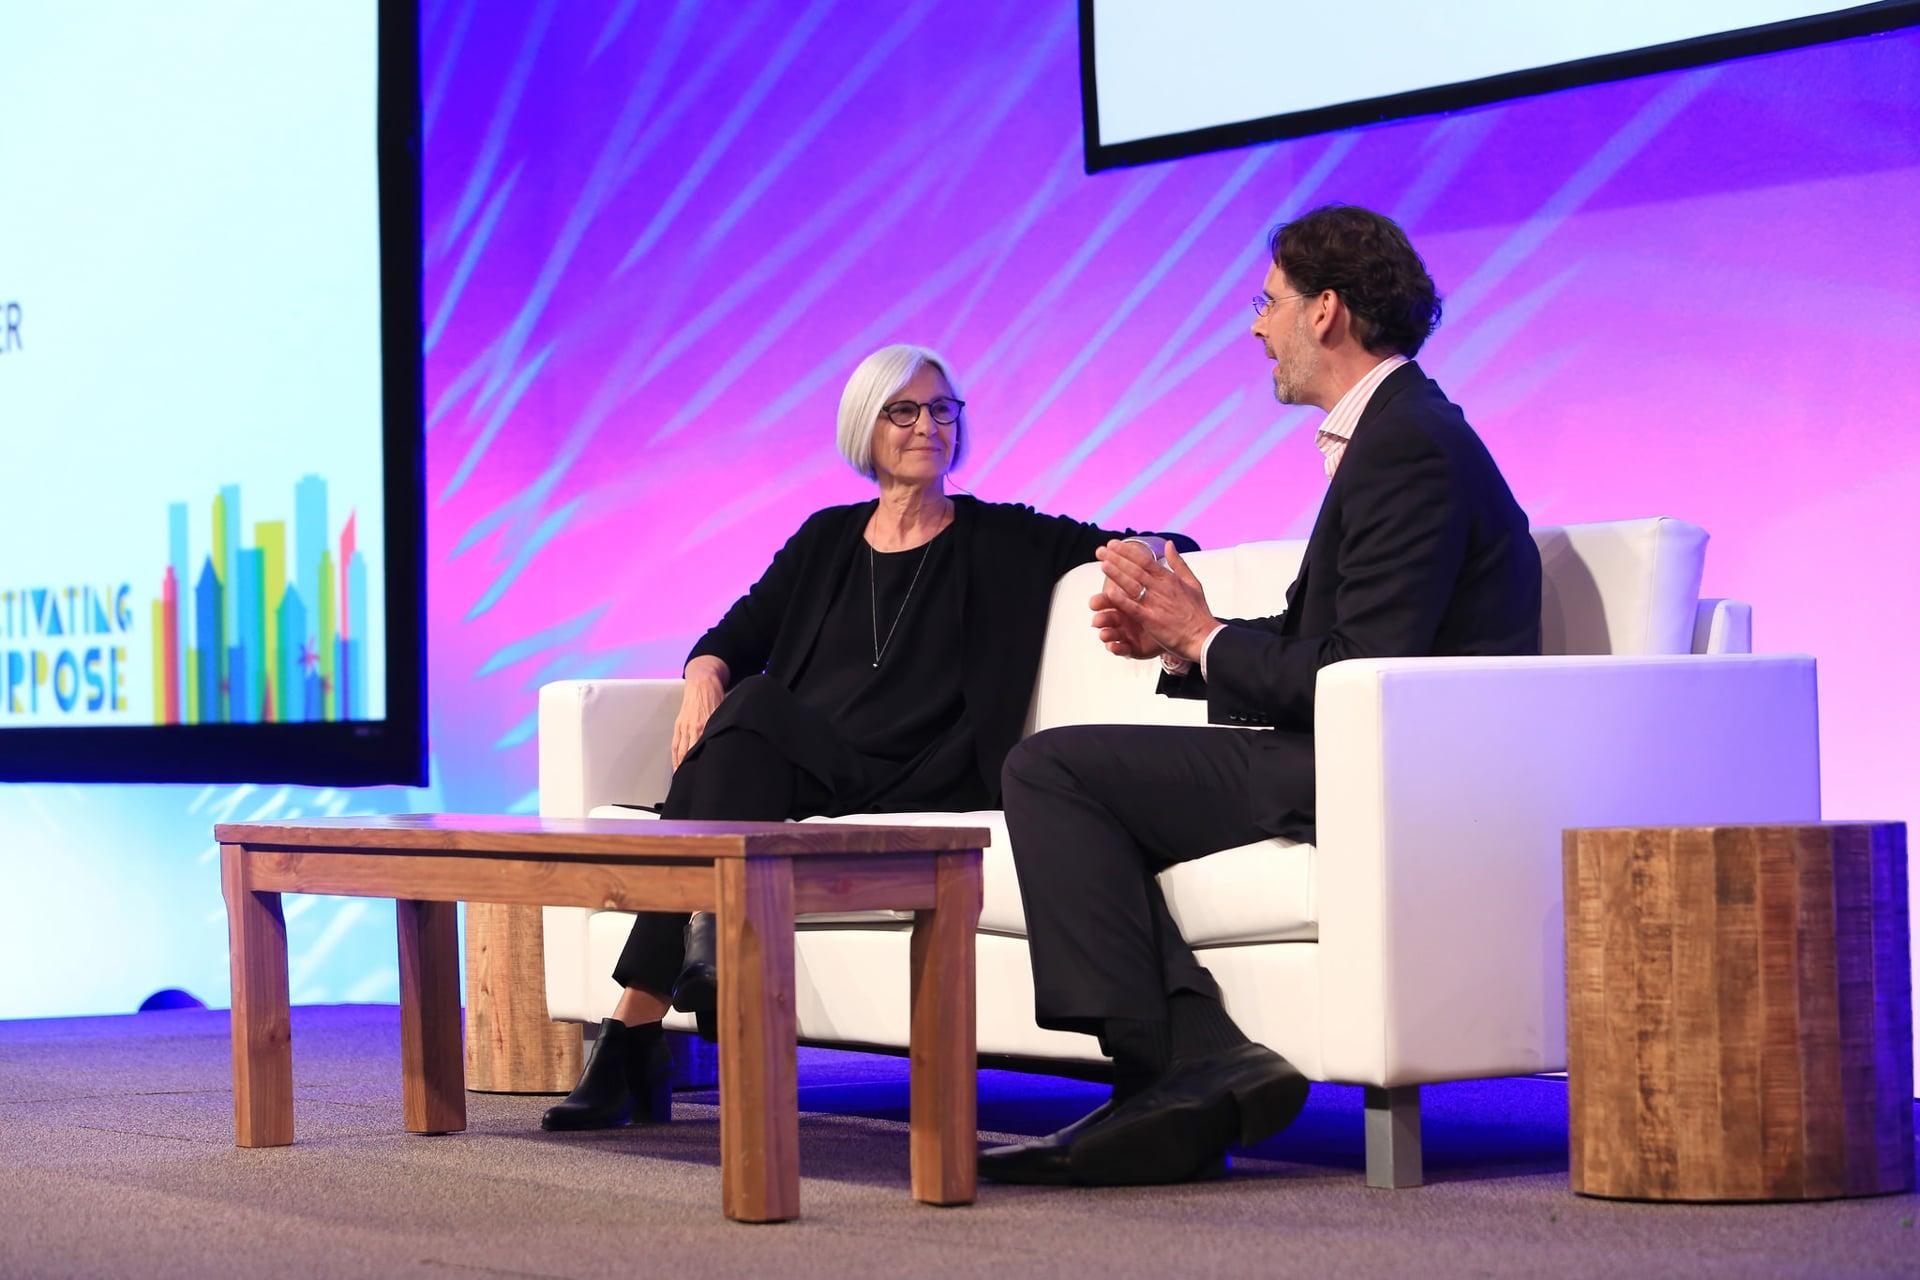 SB'16 San Diego Keynote / A Conversation with Eileen Fisher